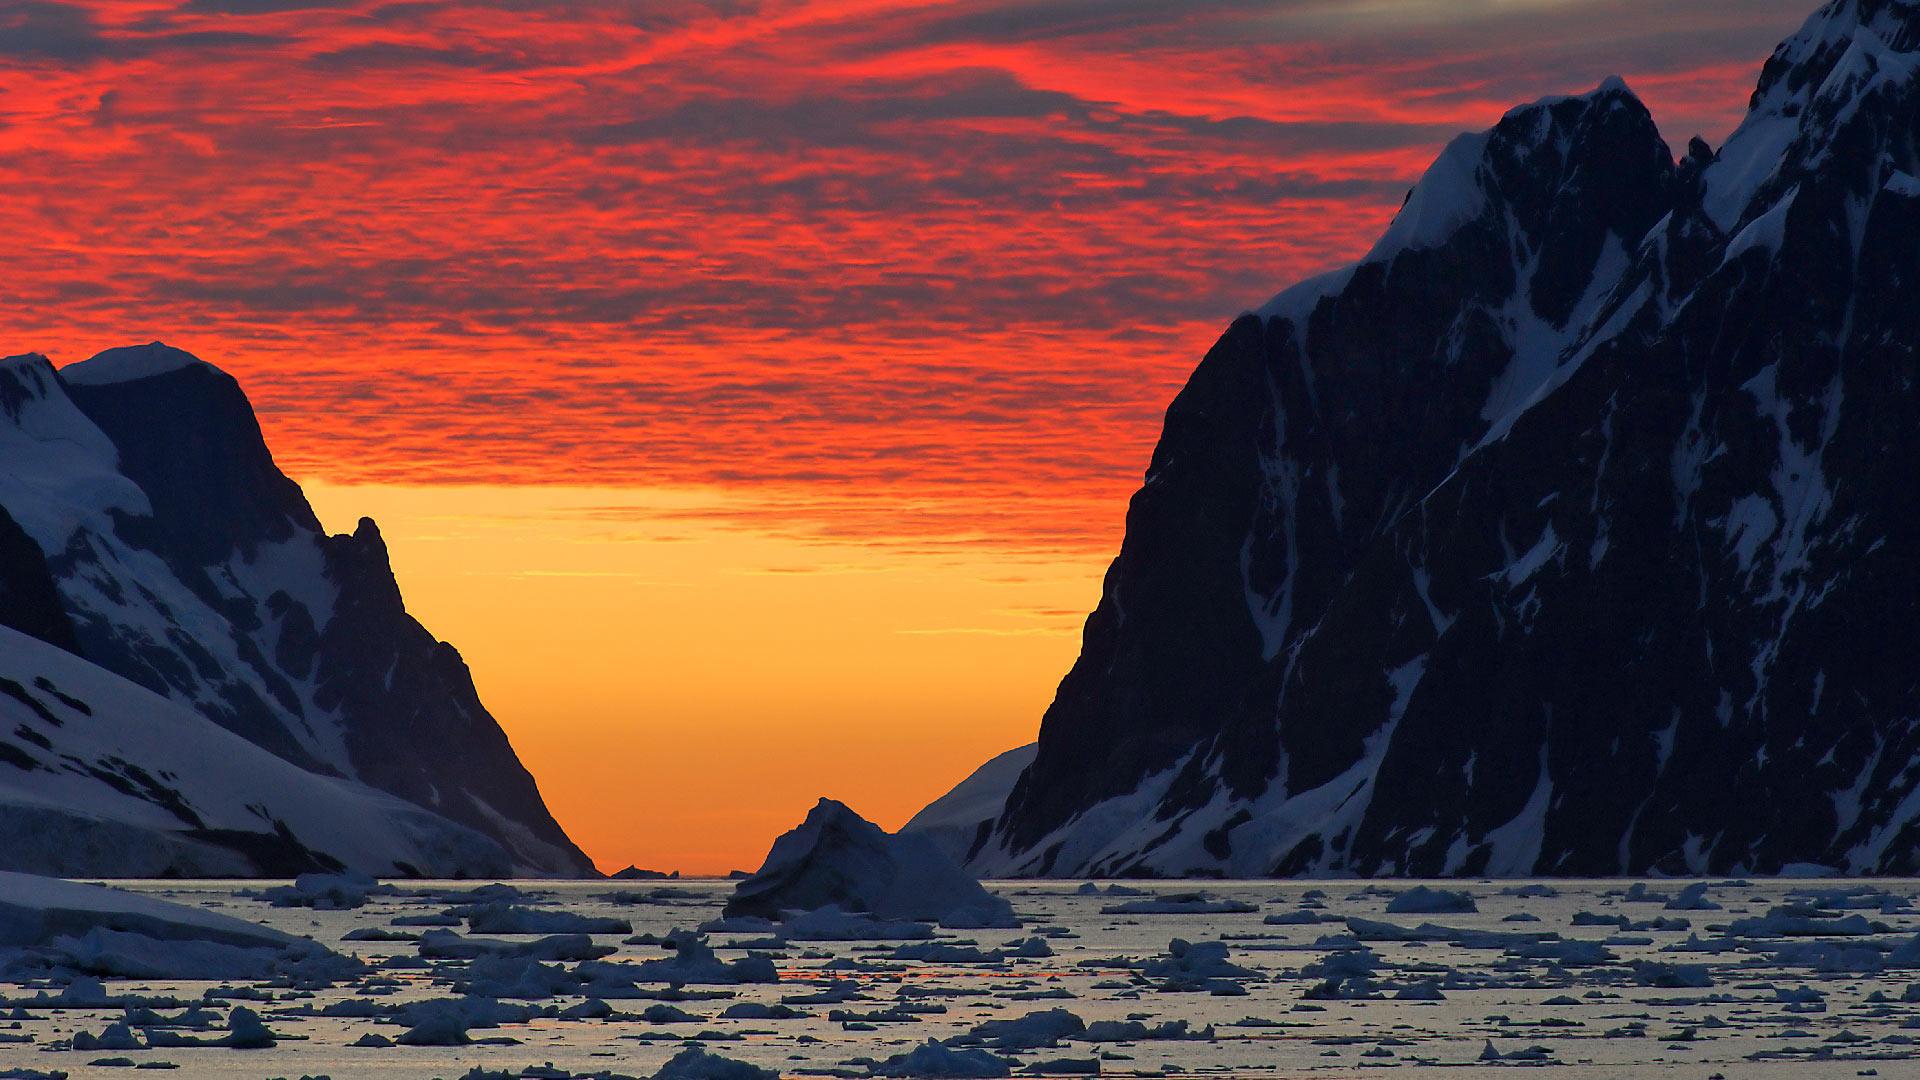 Red Antarctica